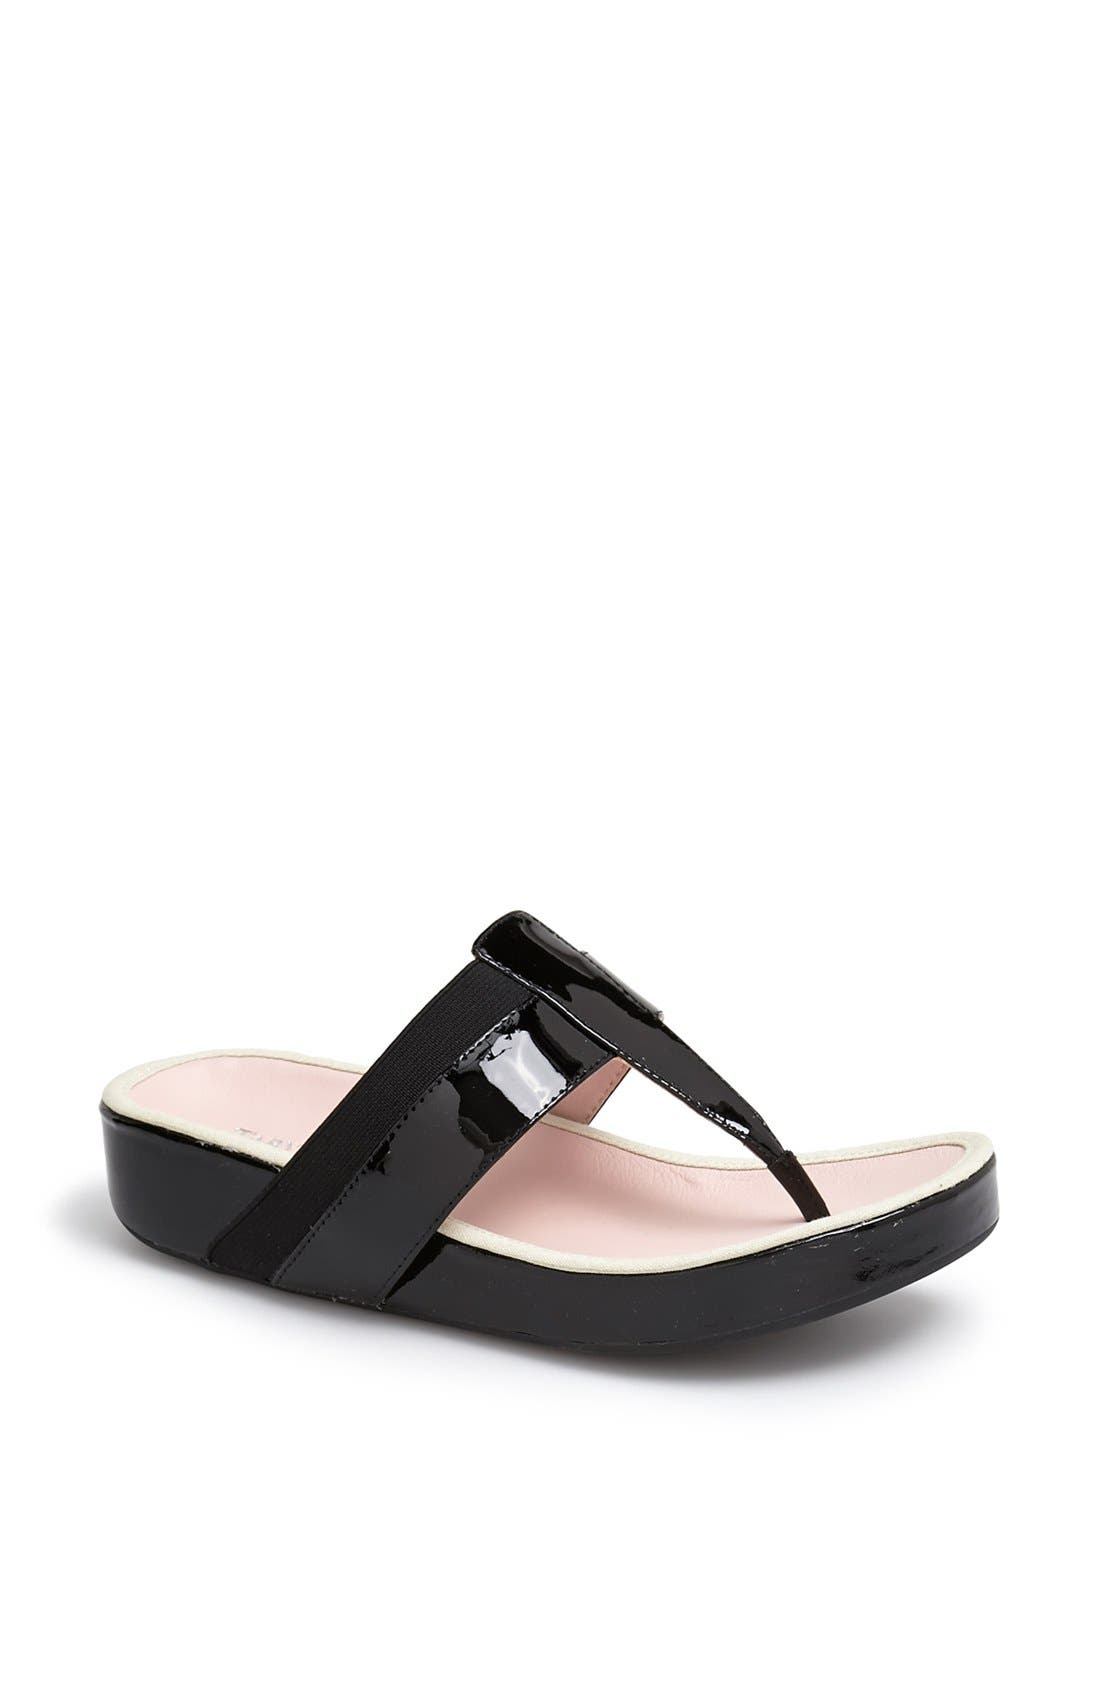 Main Image - Taryn Rose 'August' Thong Sandal